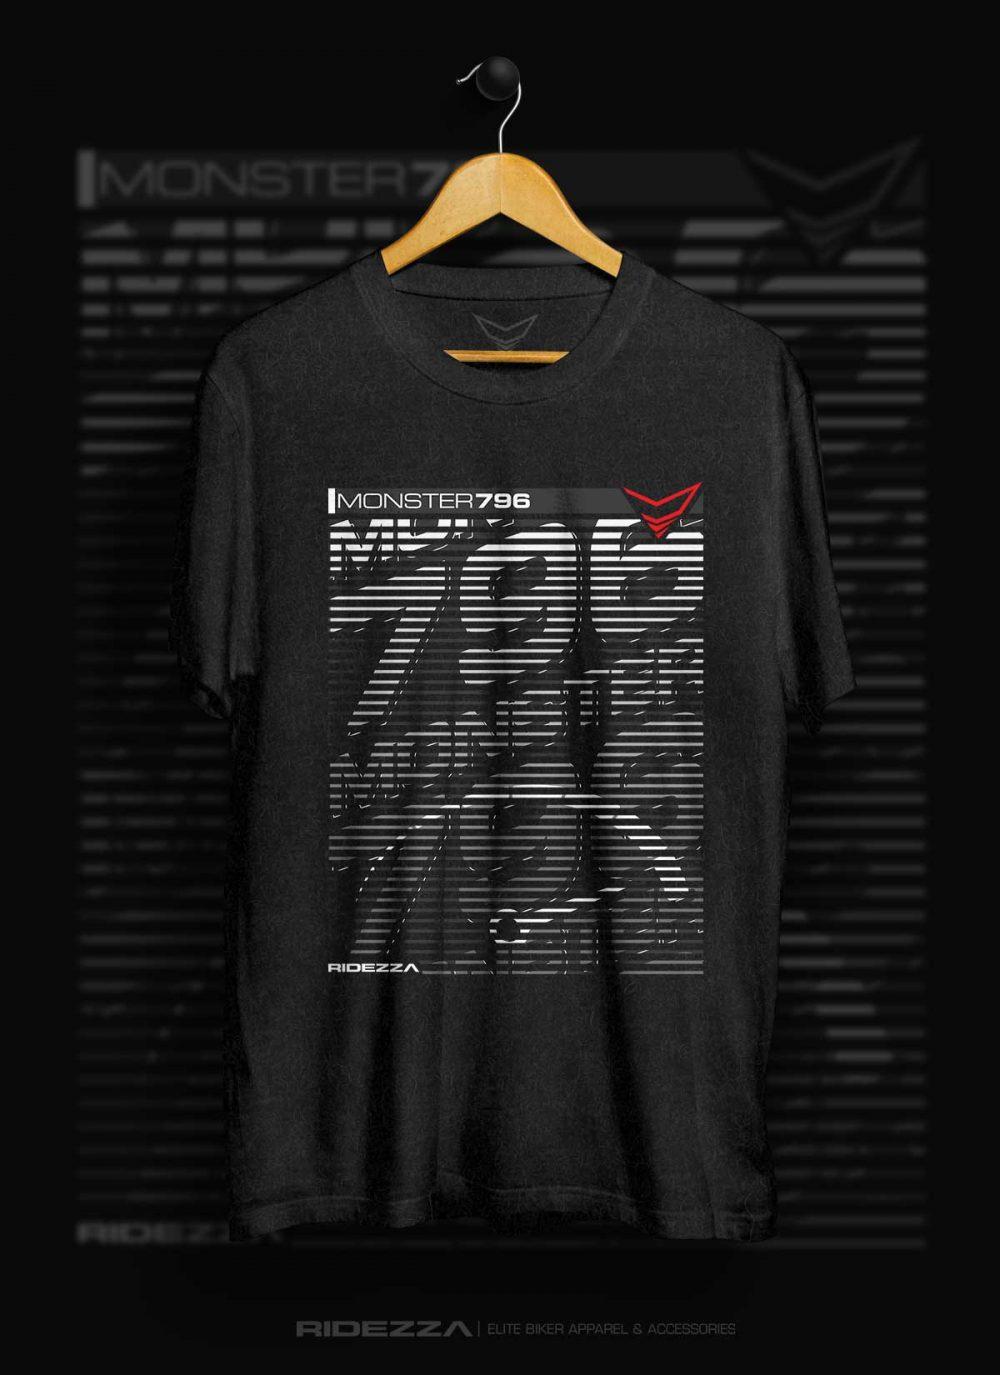 Ducati Monster 796 Speedy T-Shirt